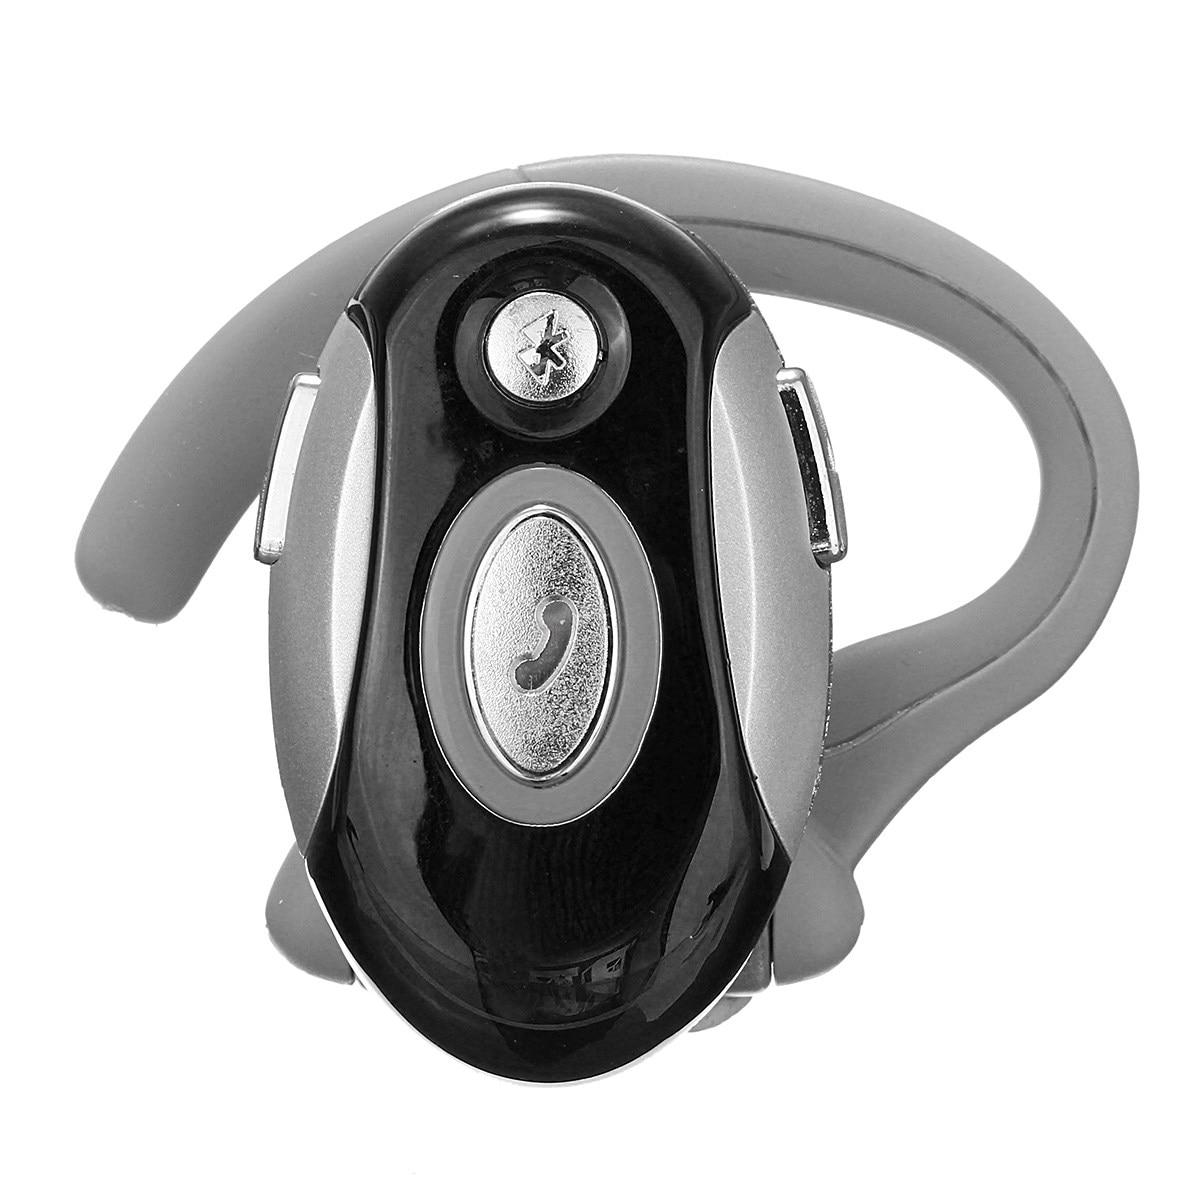 Mini LED Bluetooth 2.1 Earphone With Mic Safe Driving Wireless Earphones Music Ear Hook Handsfree Headset Universal Folding universal mini wireless sports earphone car bluetooth 4 1 receiver handsfree 3 5mm aux music stereo audio adapter mic headset